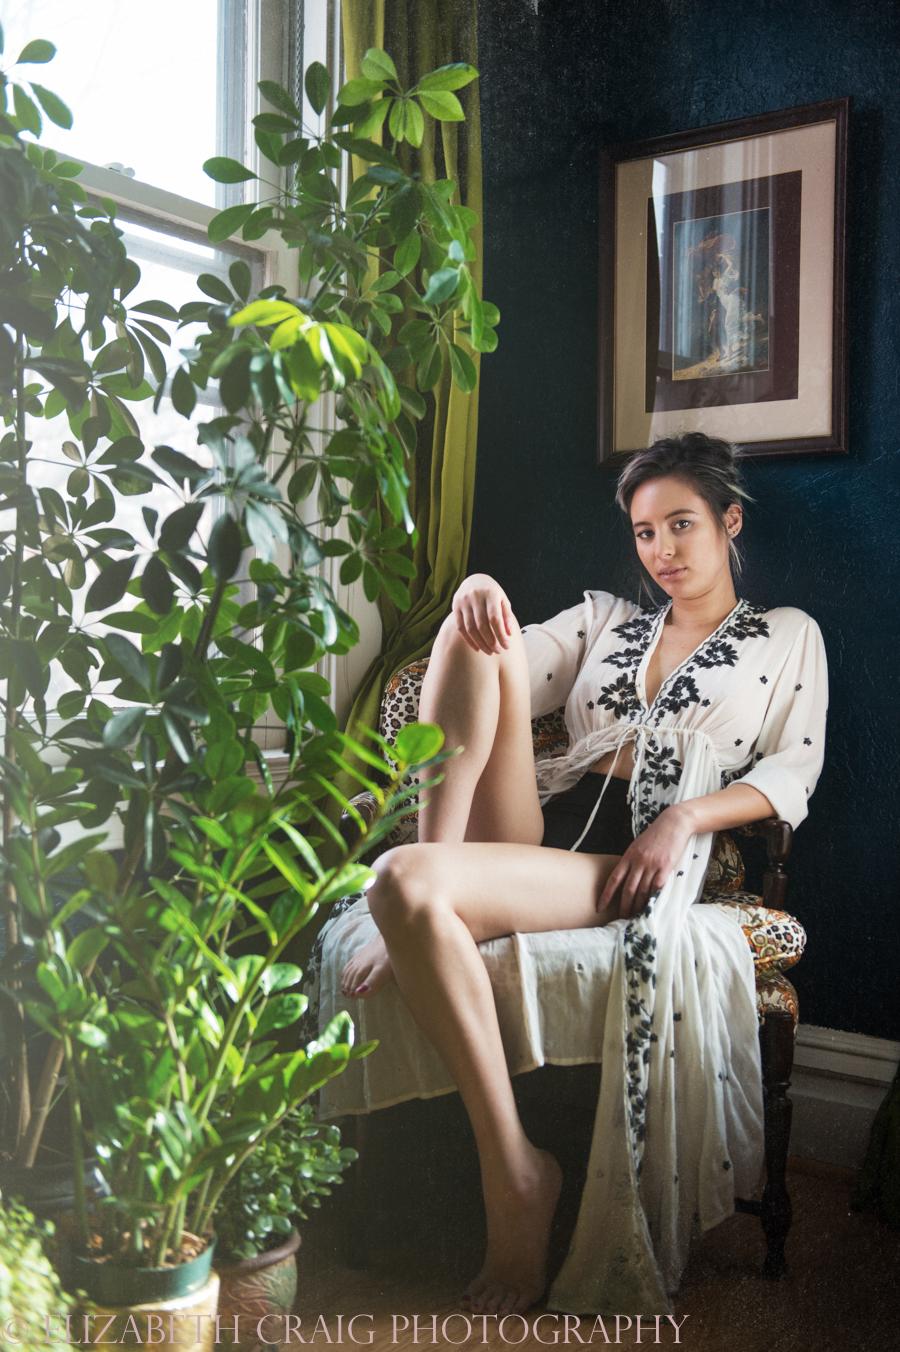 pittsburgh-boudoir-photographer-elizabeth-craig-photography-4